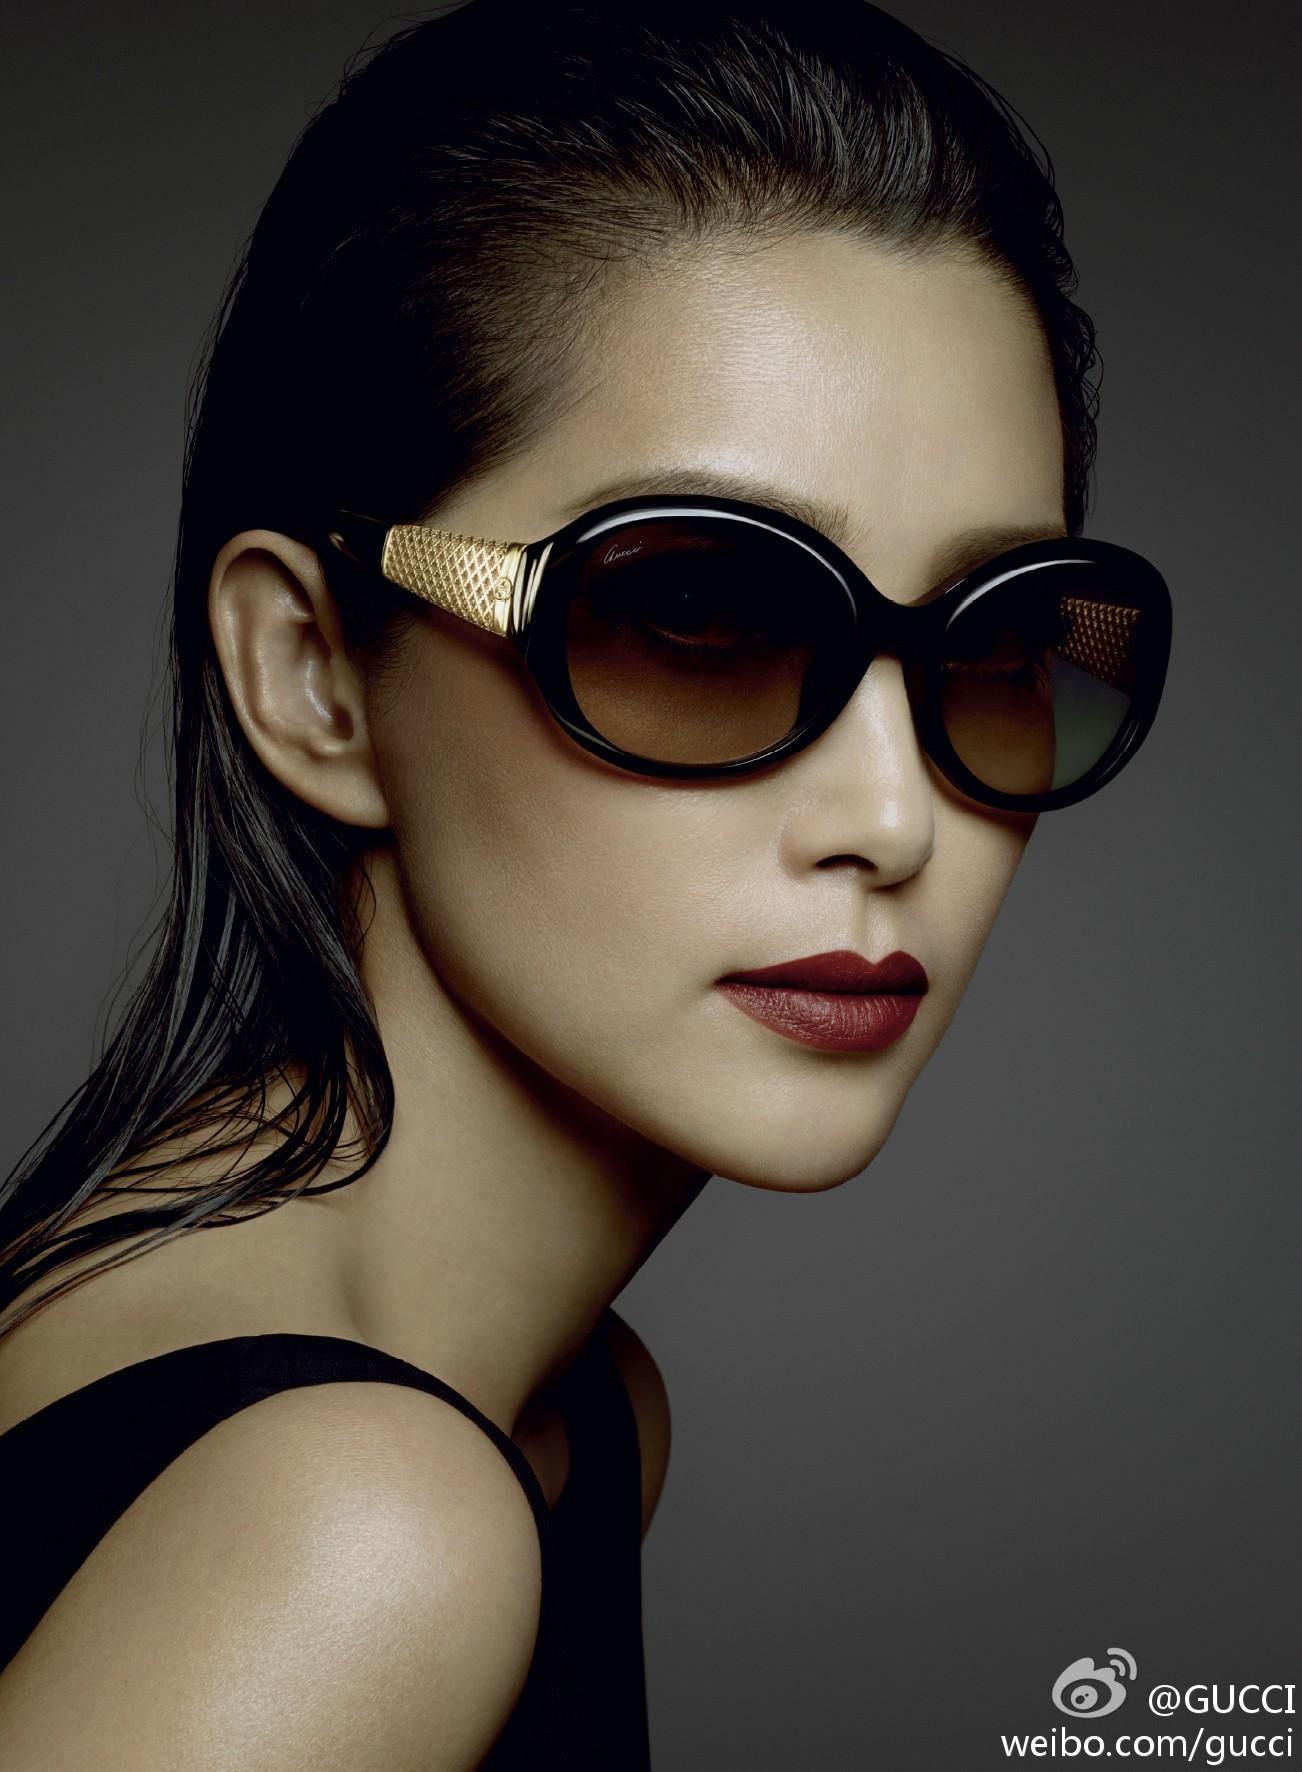 Advertising campaign   Gucci✖️眼镜系列李冰冰、全智贤、倪妮拍